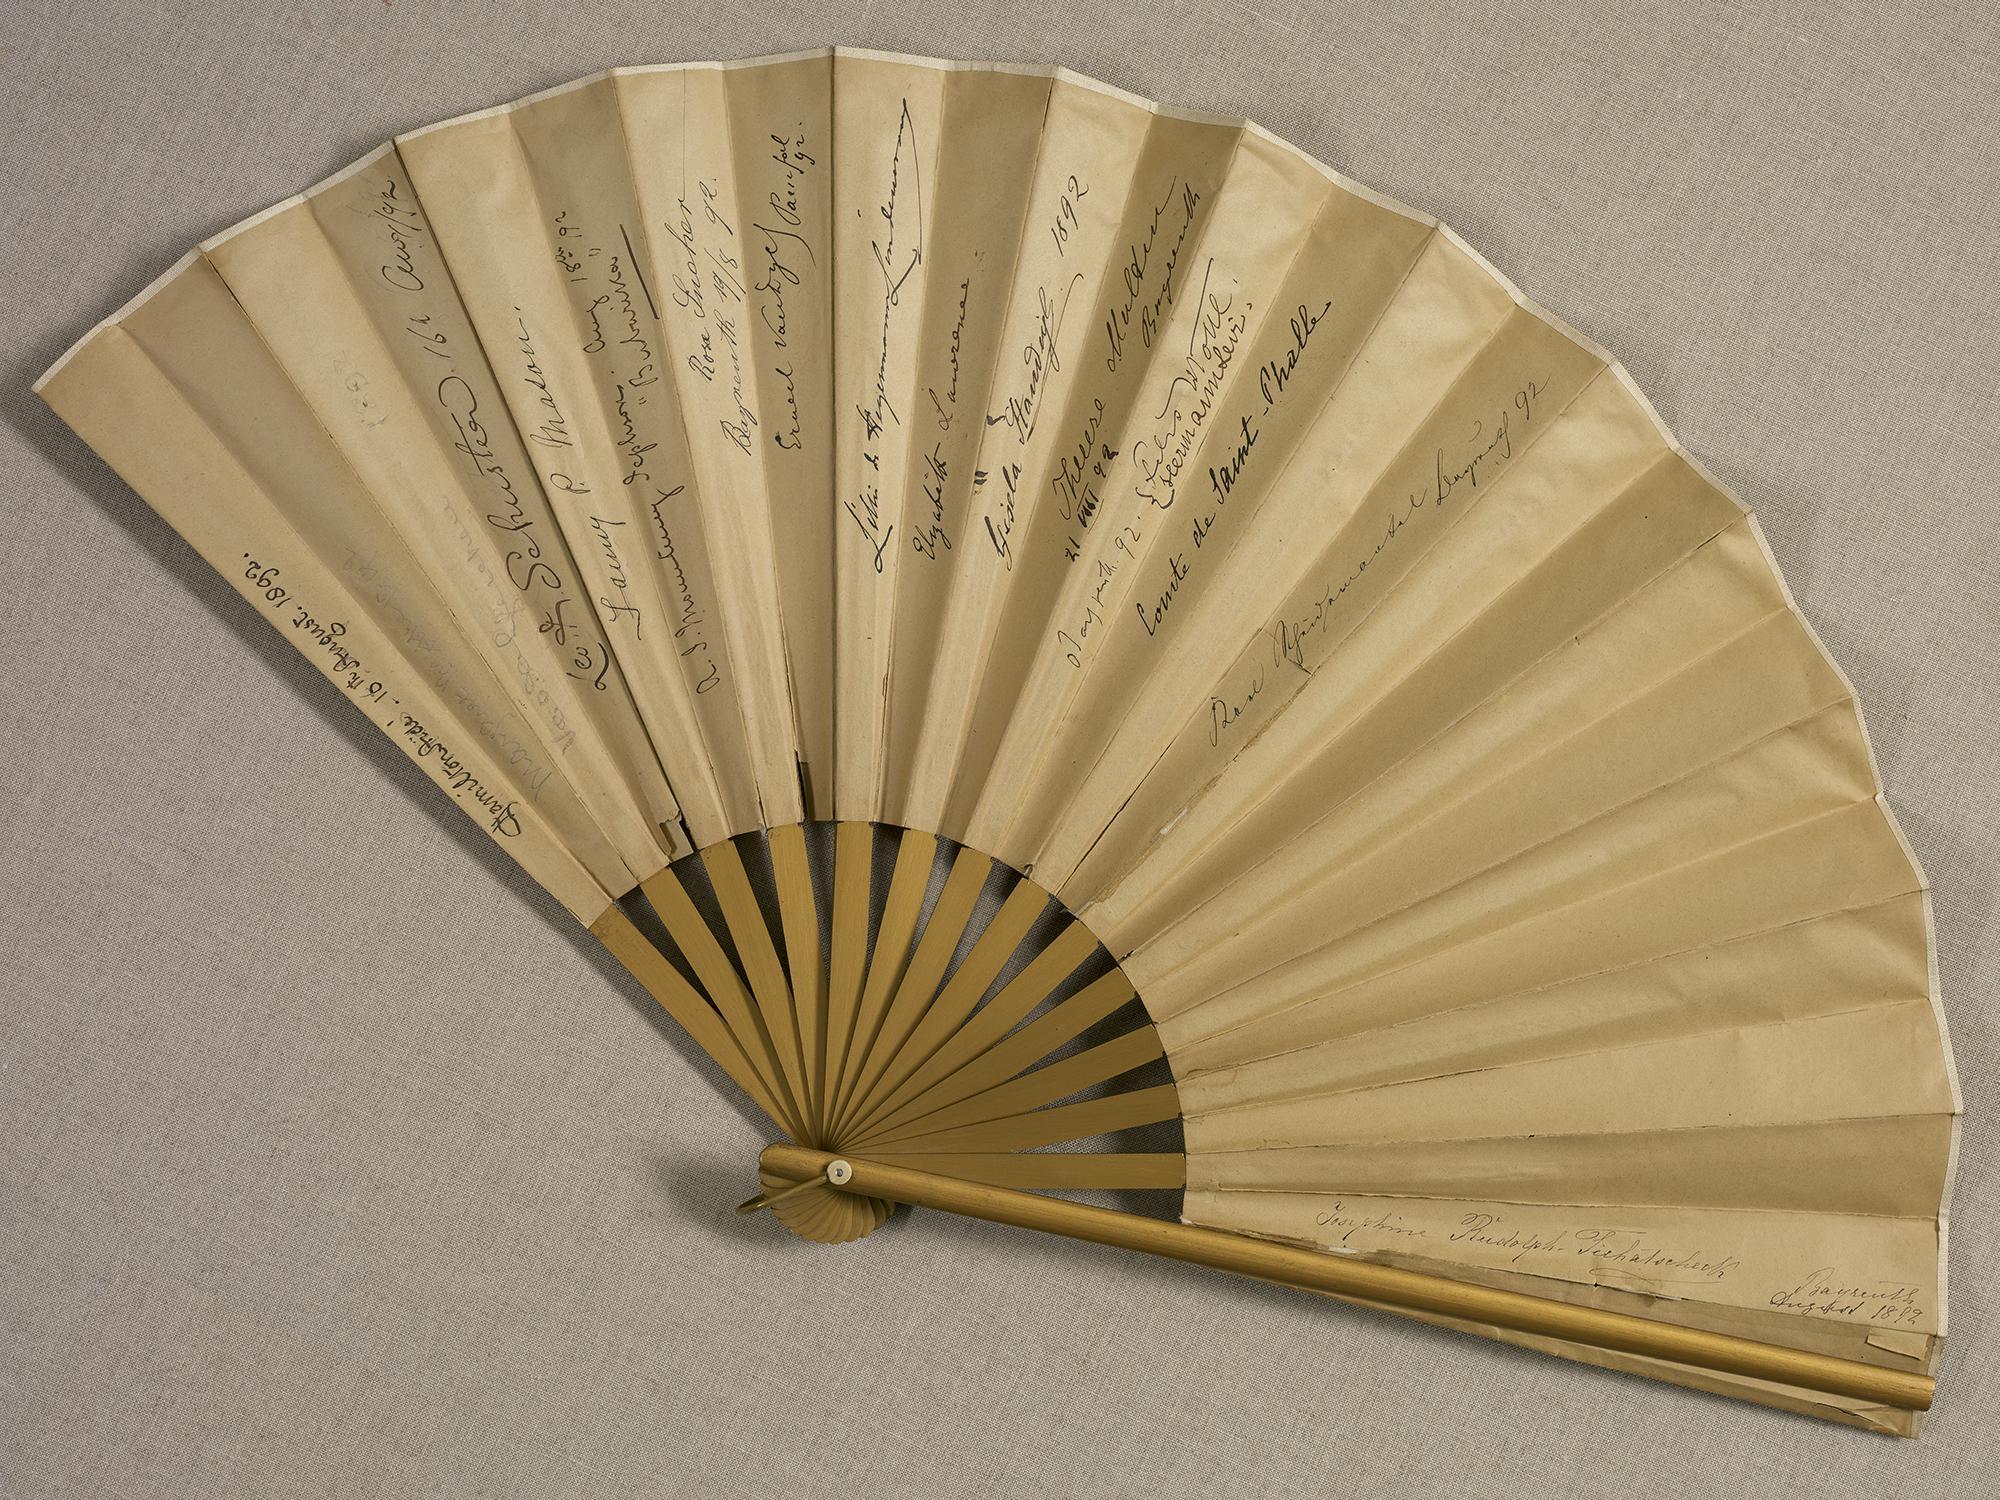 A tan folding fan with some writing.